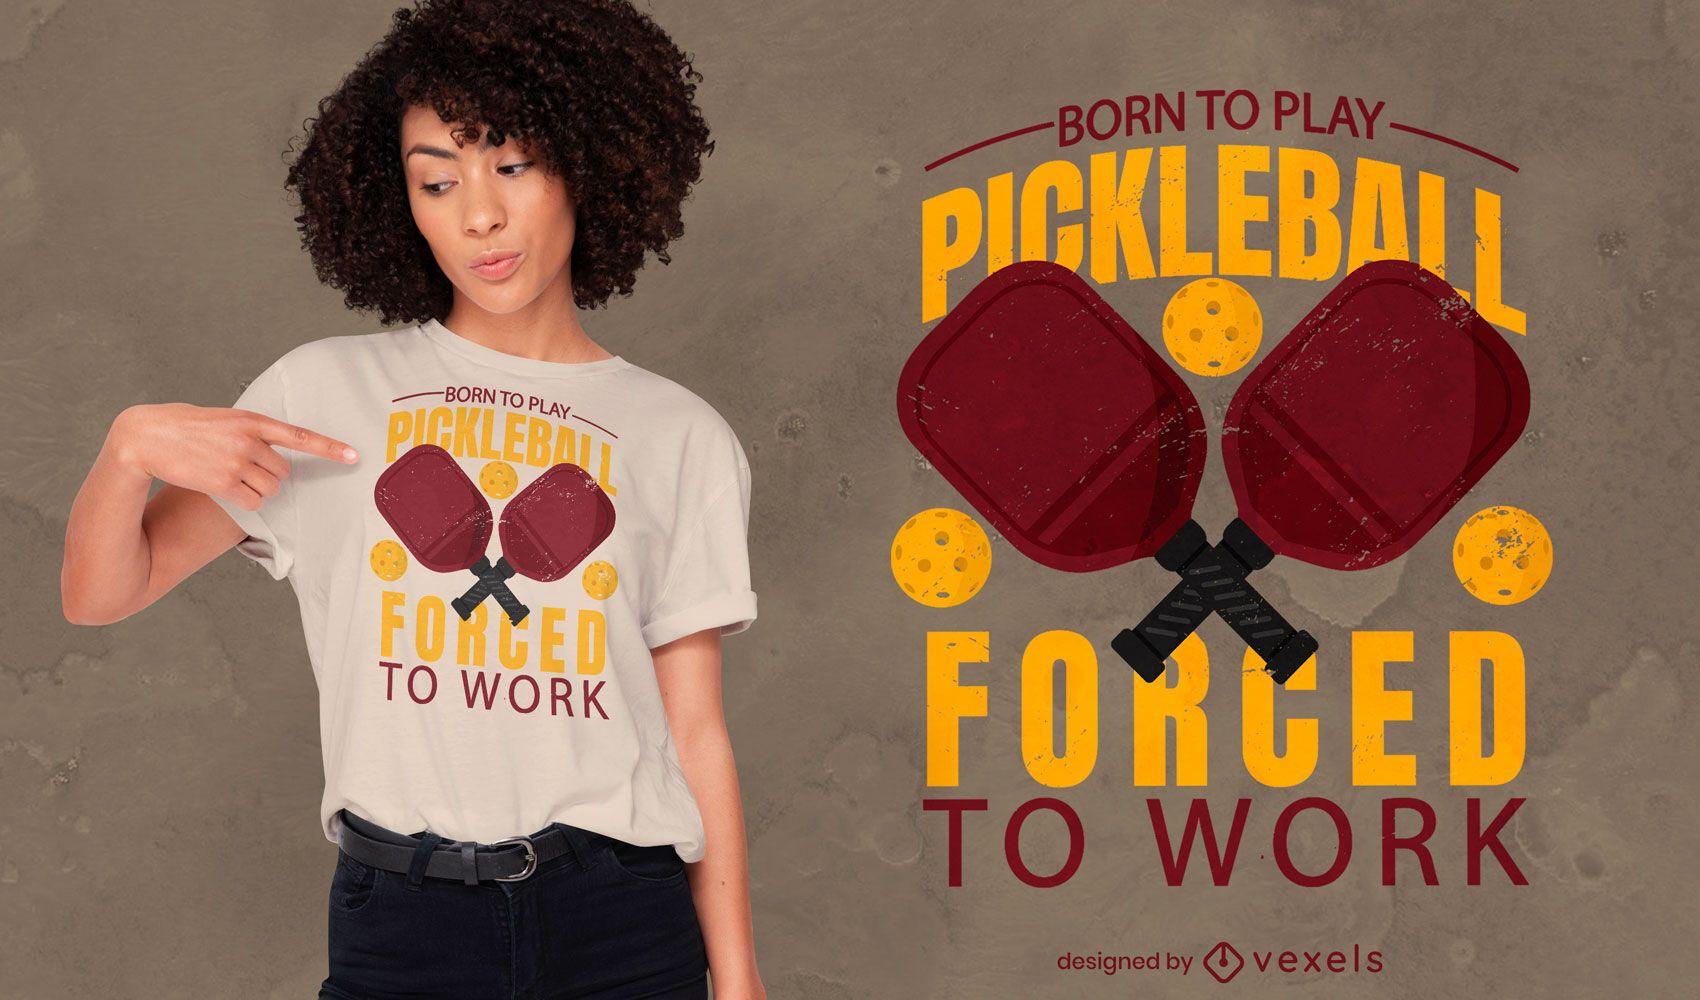 Pickleball sport quote t-shirt design